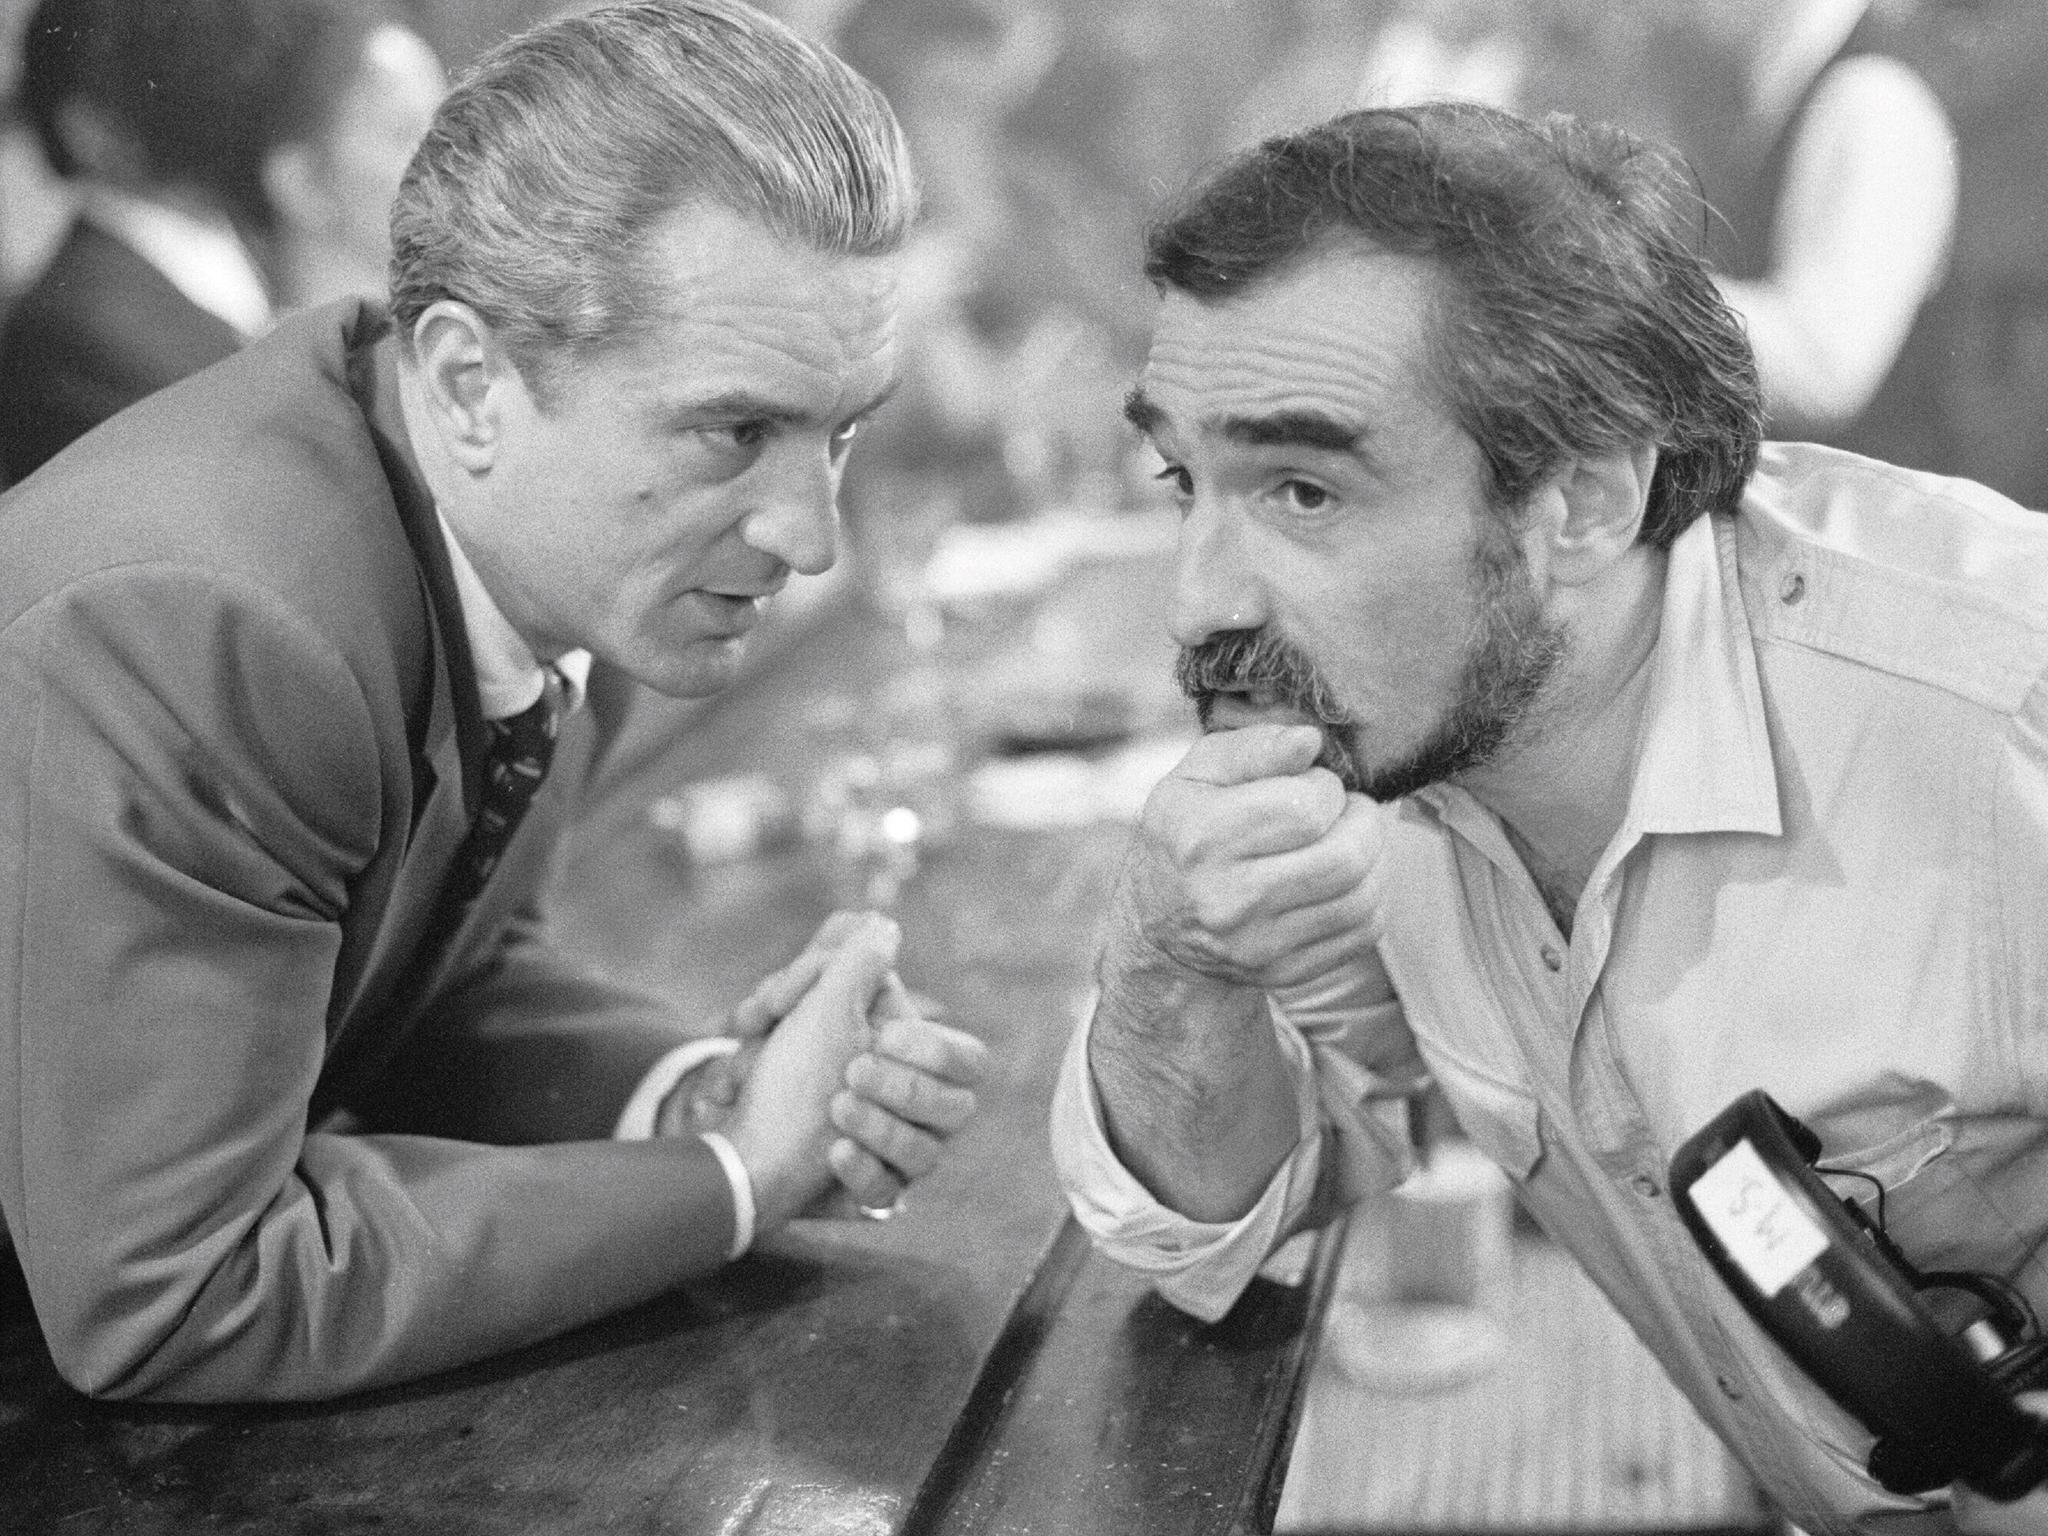 Martin Scorsese directs Robert De Niro on the 'Goodfellas' set